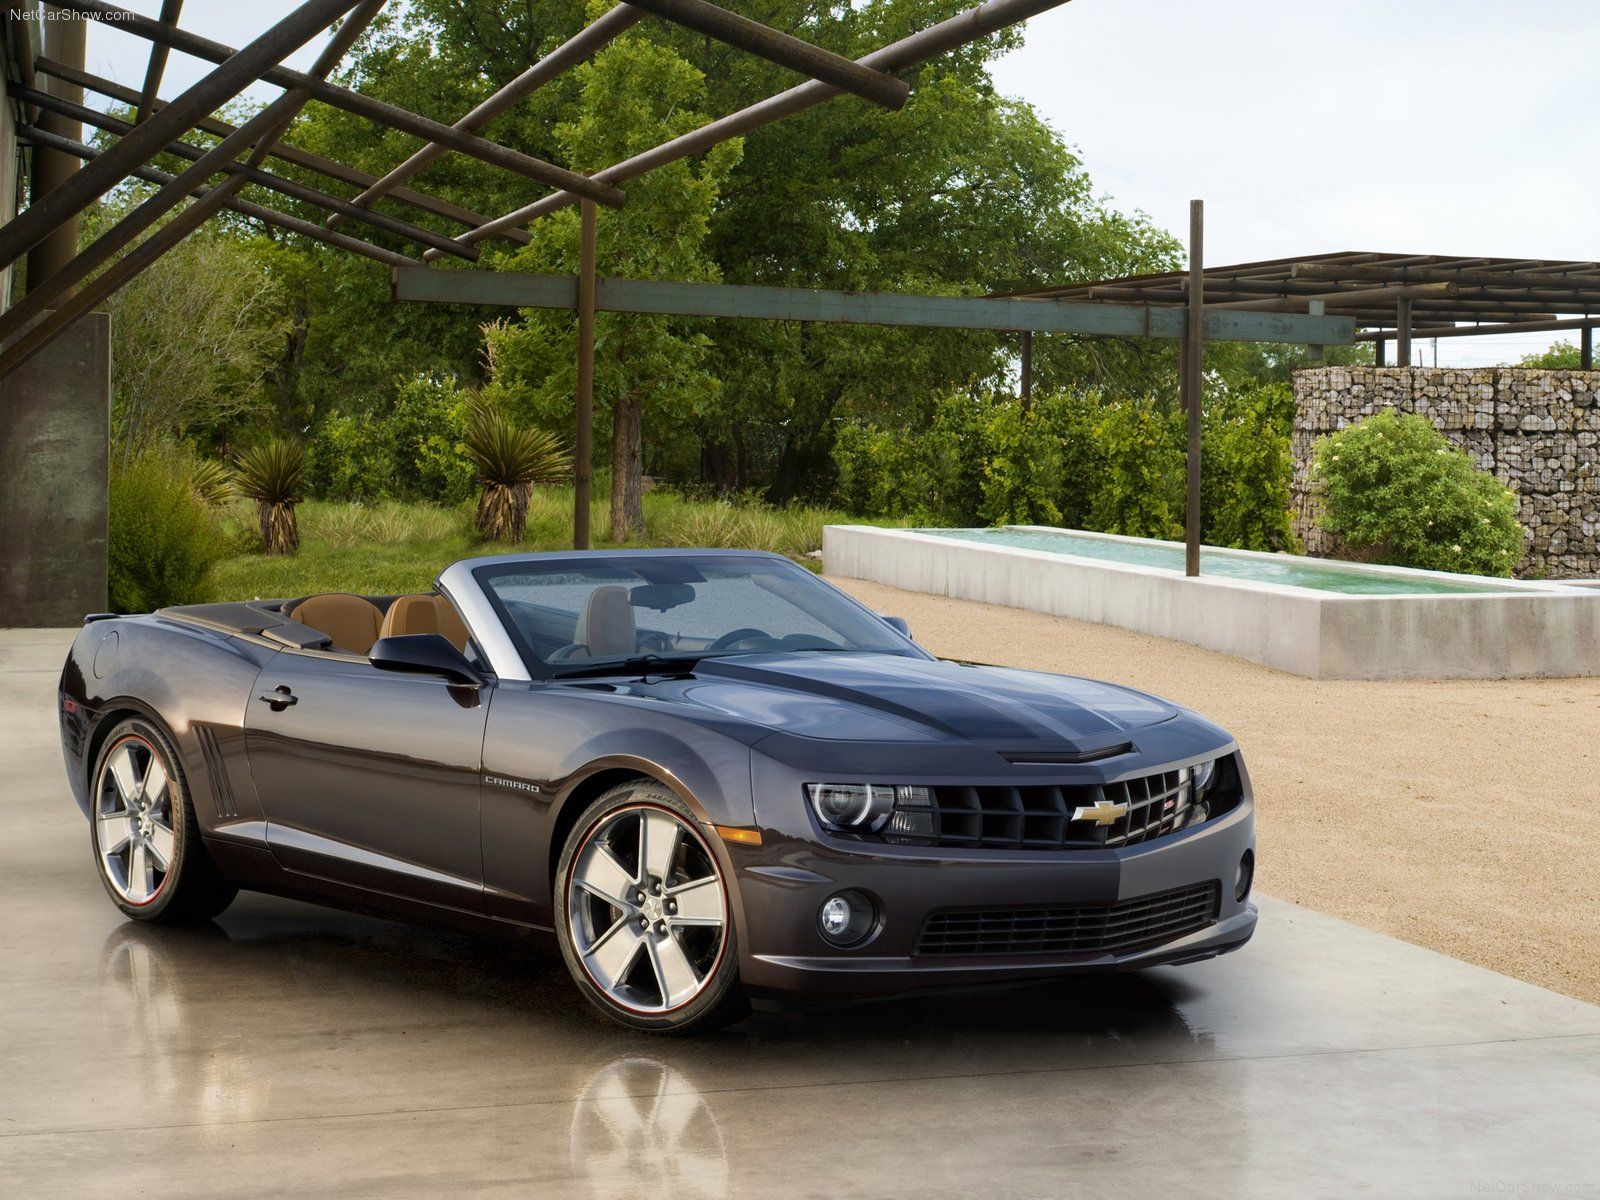 http://3.bp.blogspot.com/_OWAbzfVagFo/TKy1achzMaI/AAAAAAAAKvI/TgiXLrAz1YI/s1600/Chevrolet-Camaro_Convertible_Neiman_Marcus_2011_1600x1200_wallpaper_01.jpg